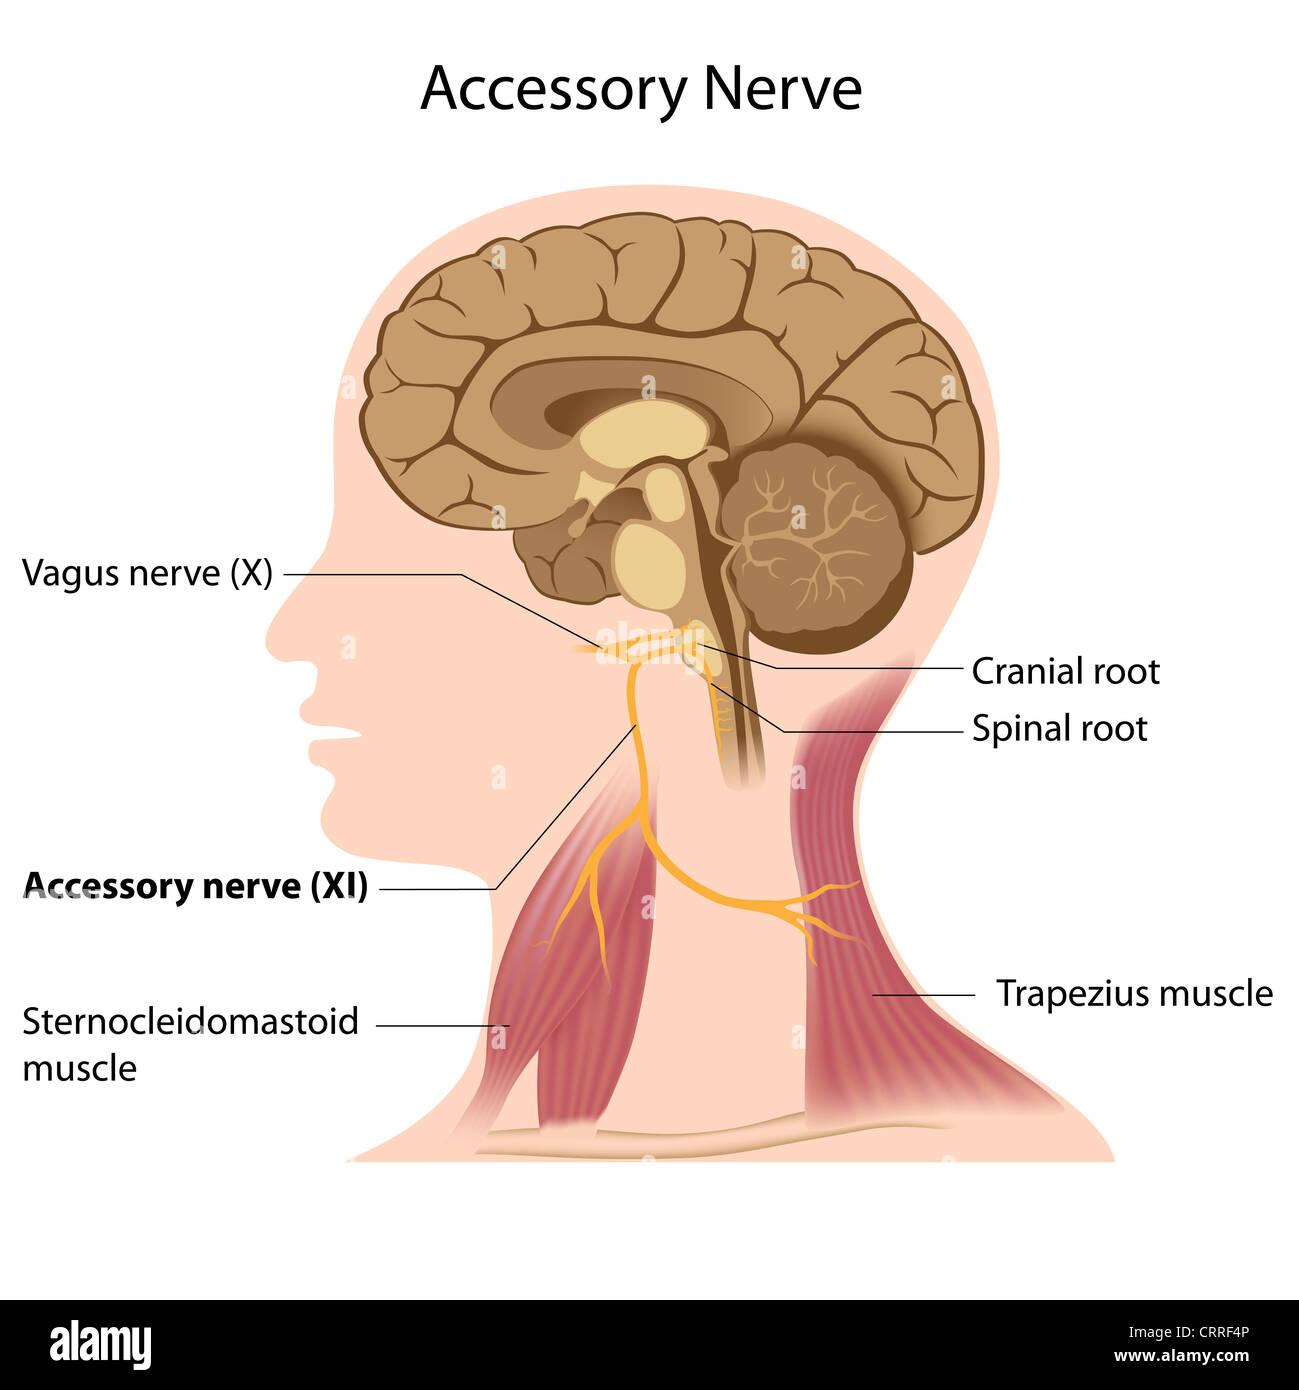 Accessory nerve anatomy Stock Photo: 49074614 - Alamy